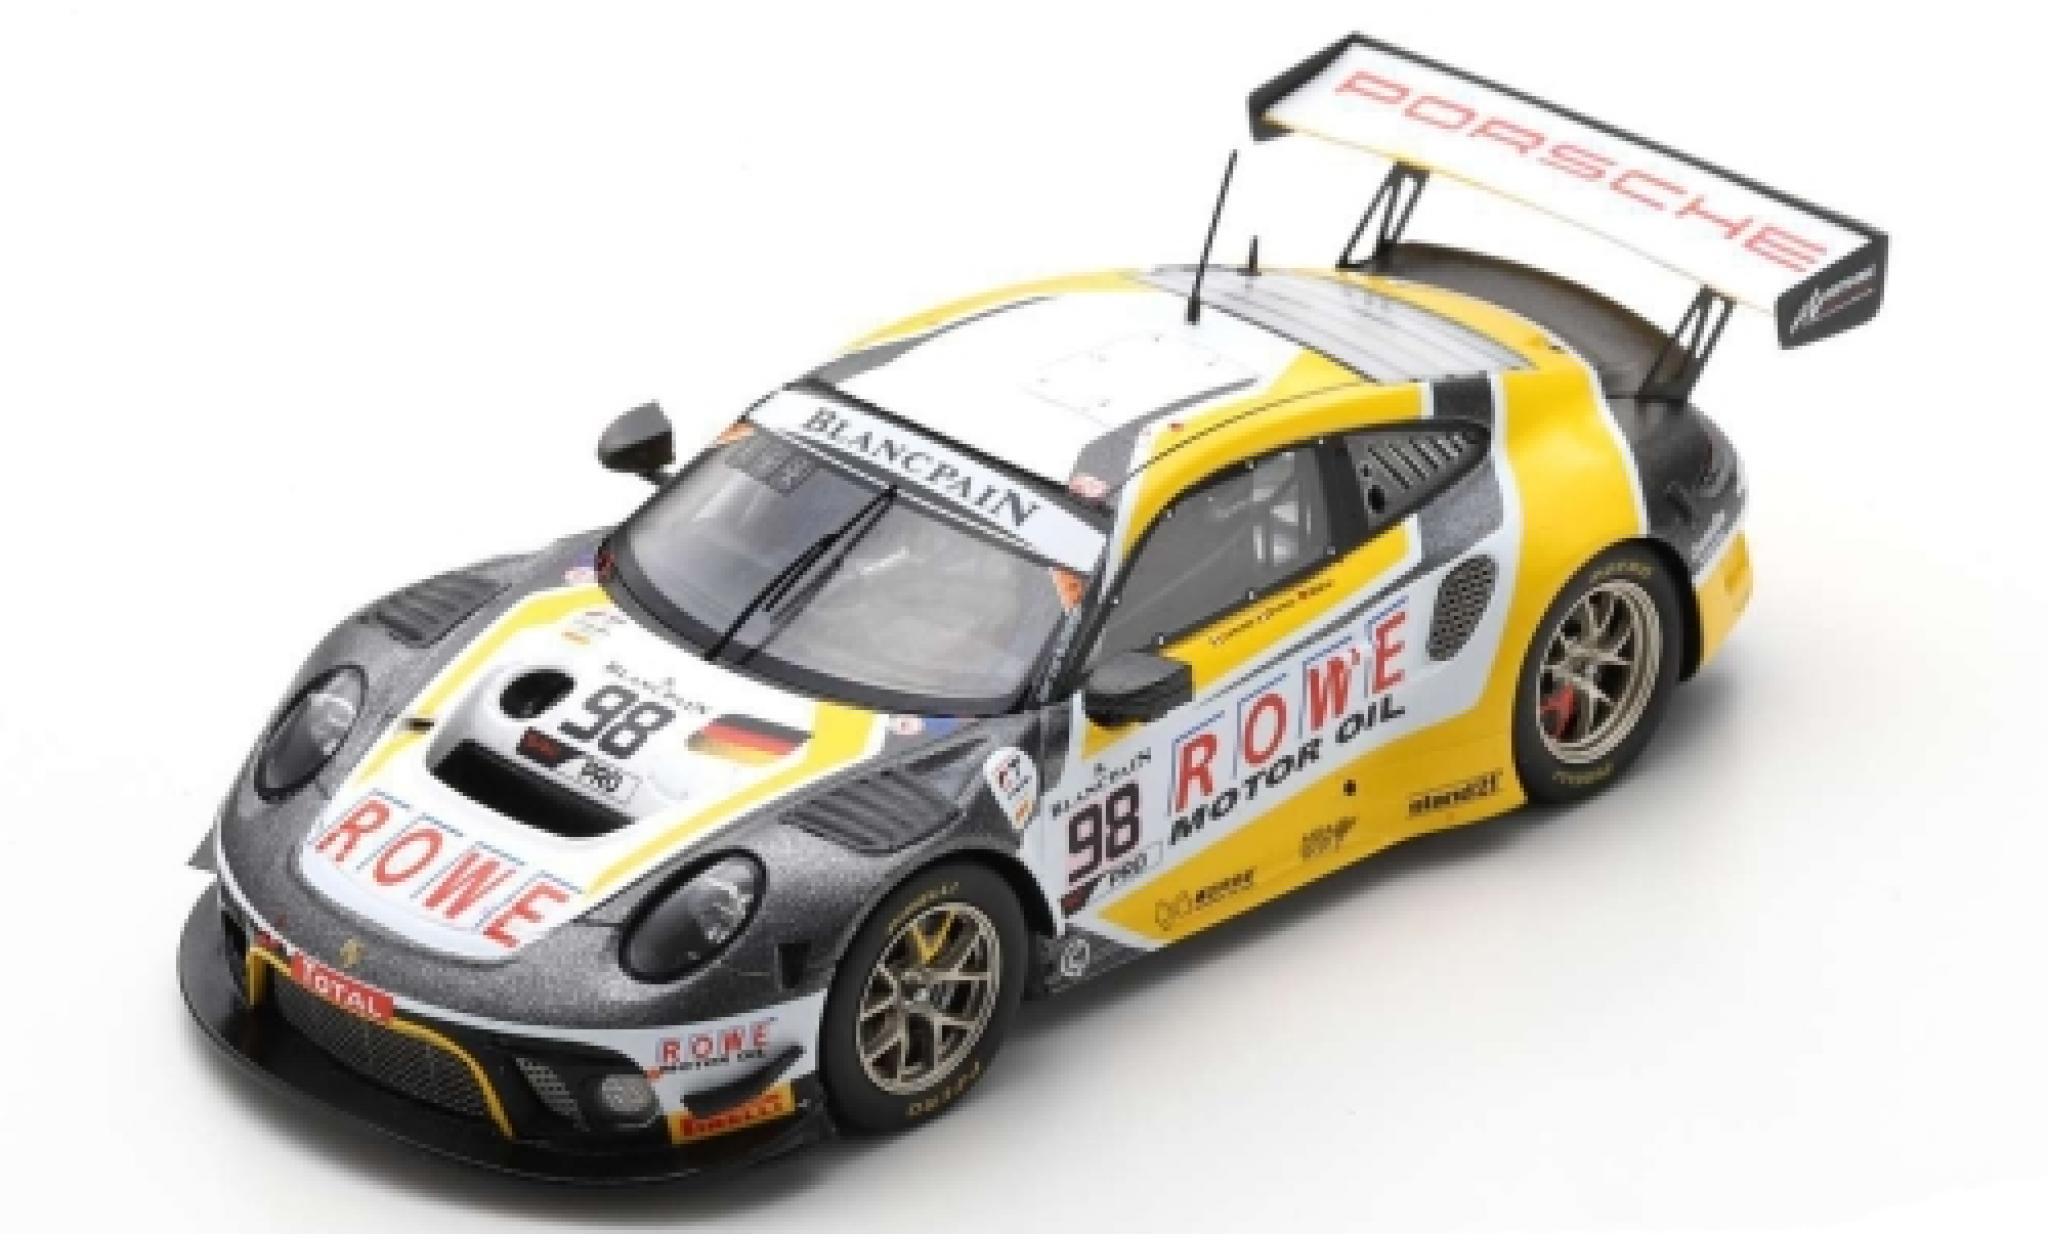 Porsche 992 GT3 R 1/43 Spark 911 (991) No.98 ROWE Racing 24h Spa 2019 S.Müller/R.Dumas/M.Jaminet